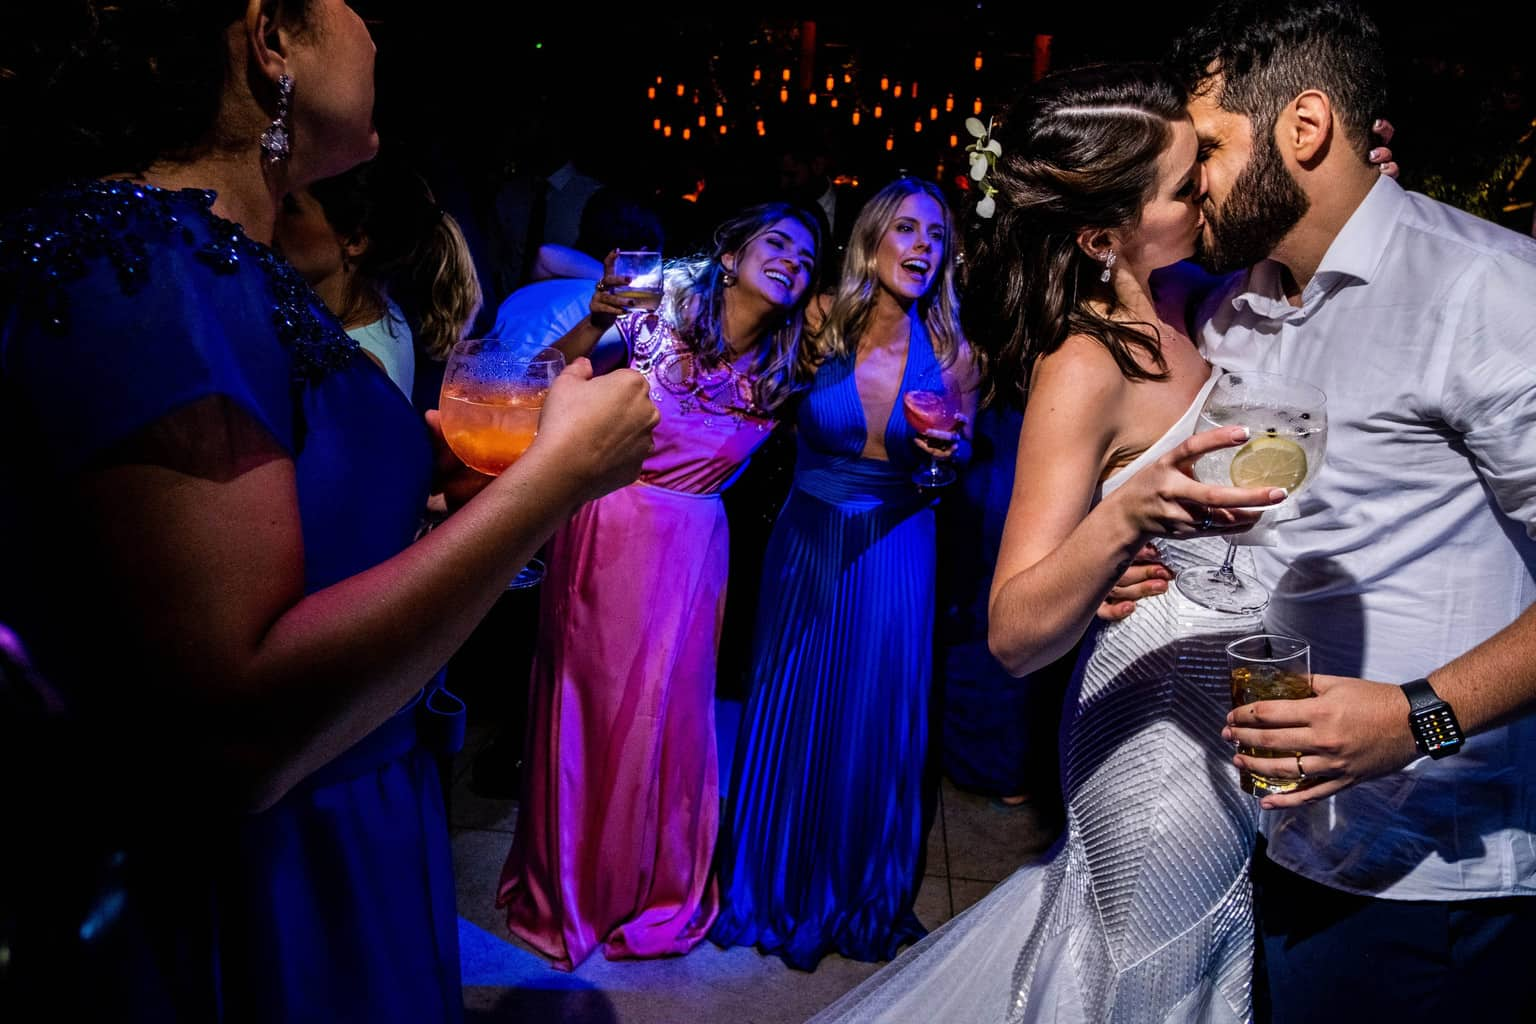 Bel-Benkler-eventos-Casamento-Ariane-e-Matheus-cerimonia-decoracao-contemporanea-fotografia-Rafael-Bigarelli-noivos-na-pista-Spazio-Giardini-46